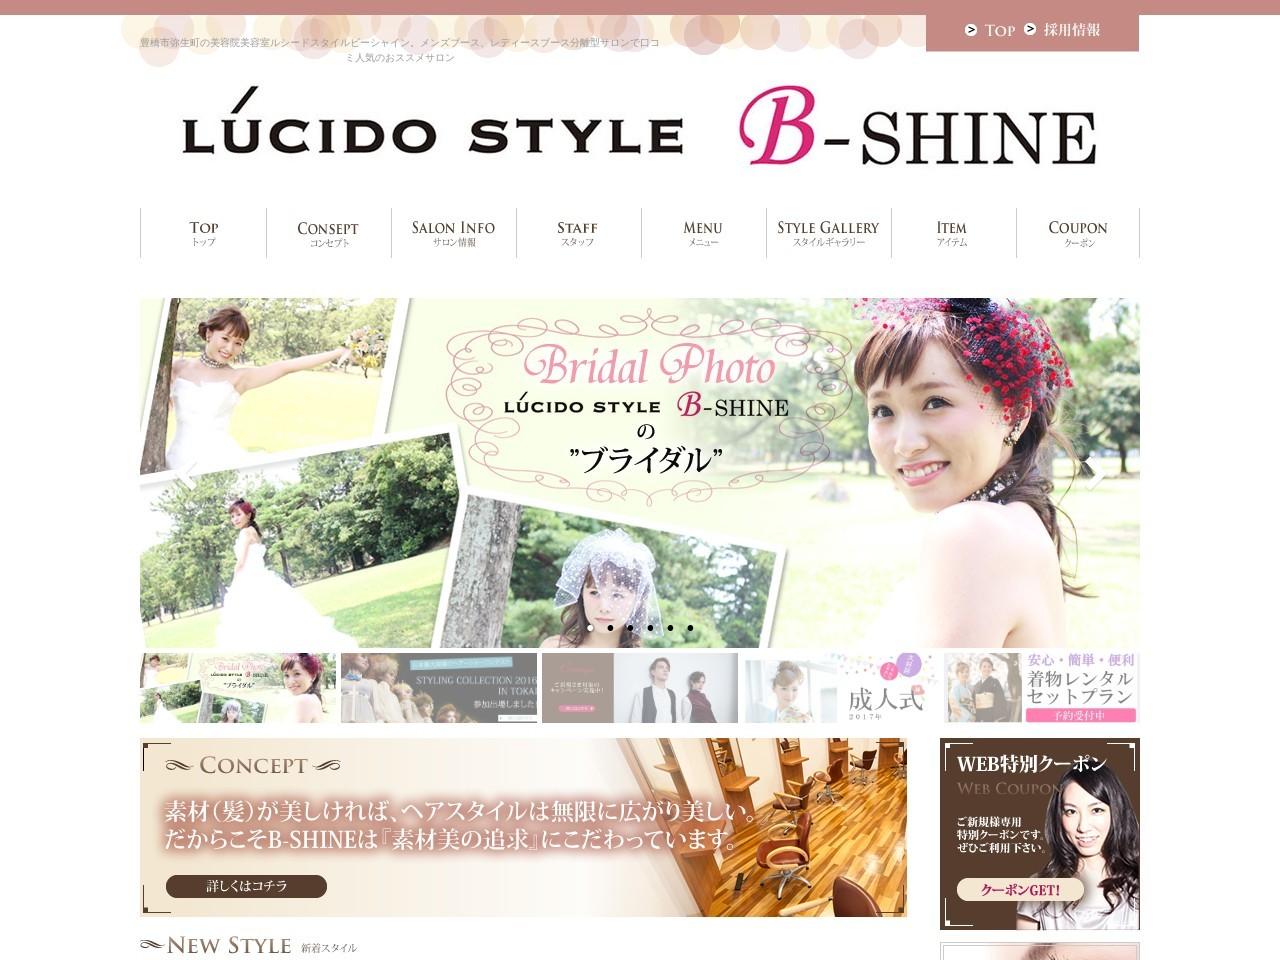 LUCIDO STYLE B-SHINE